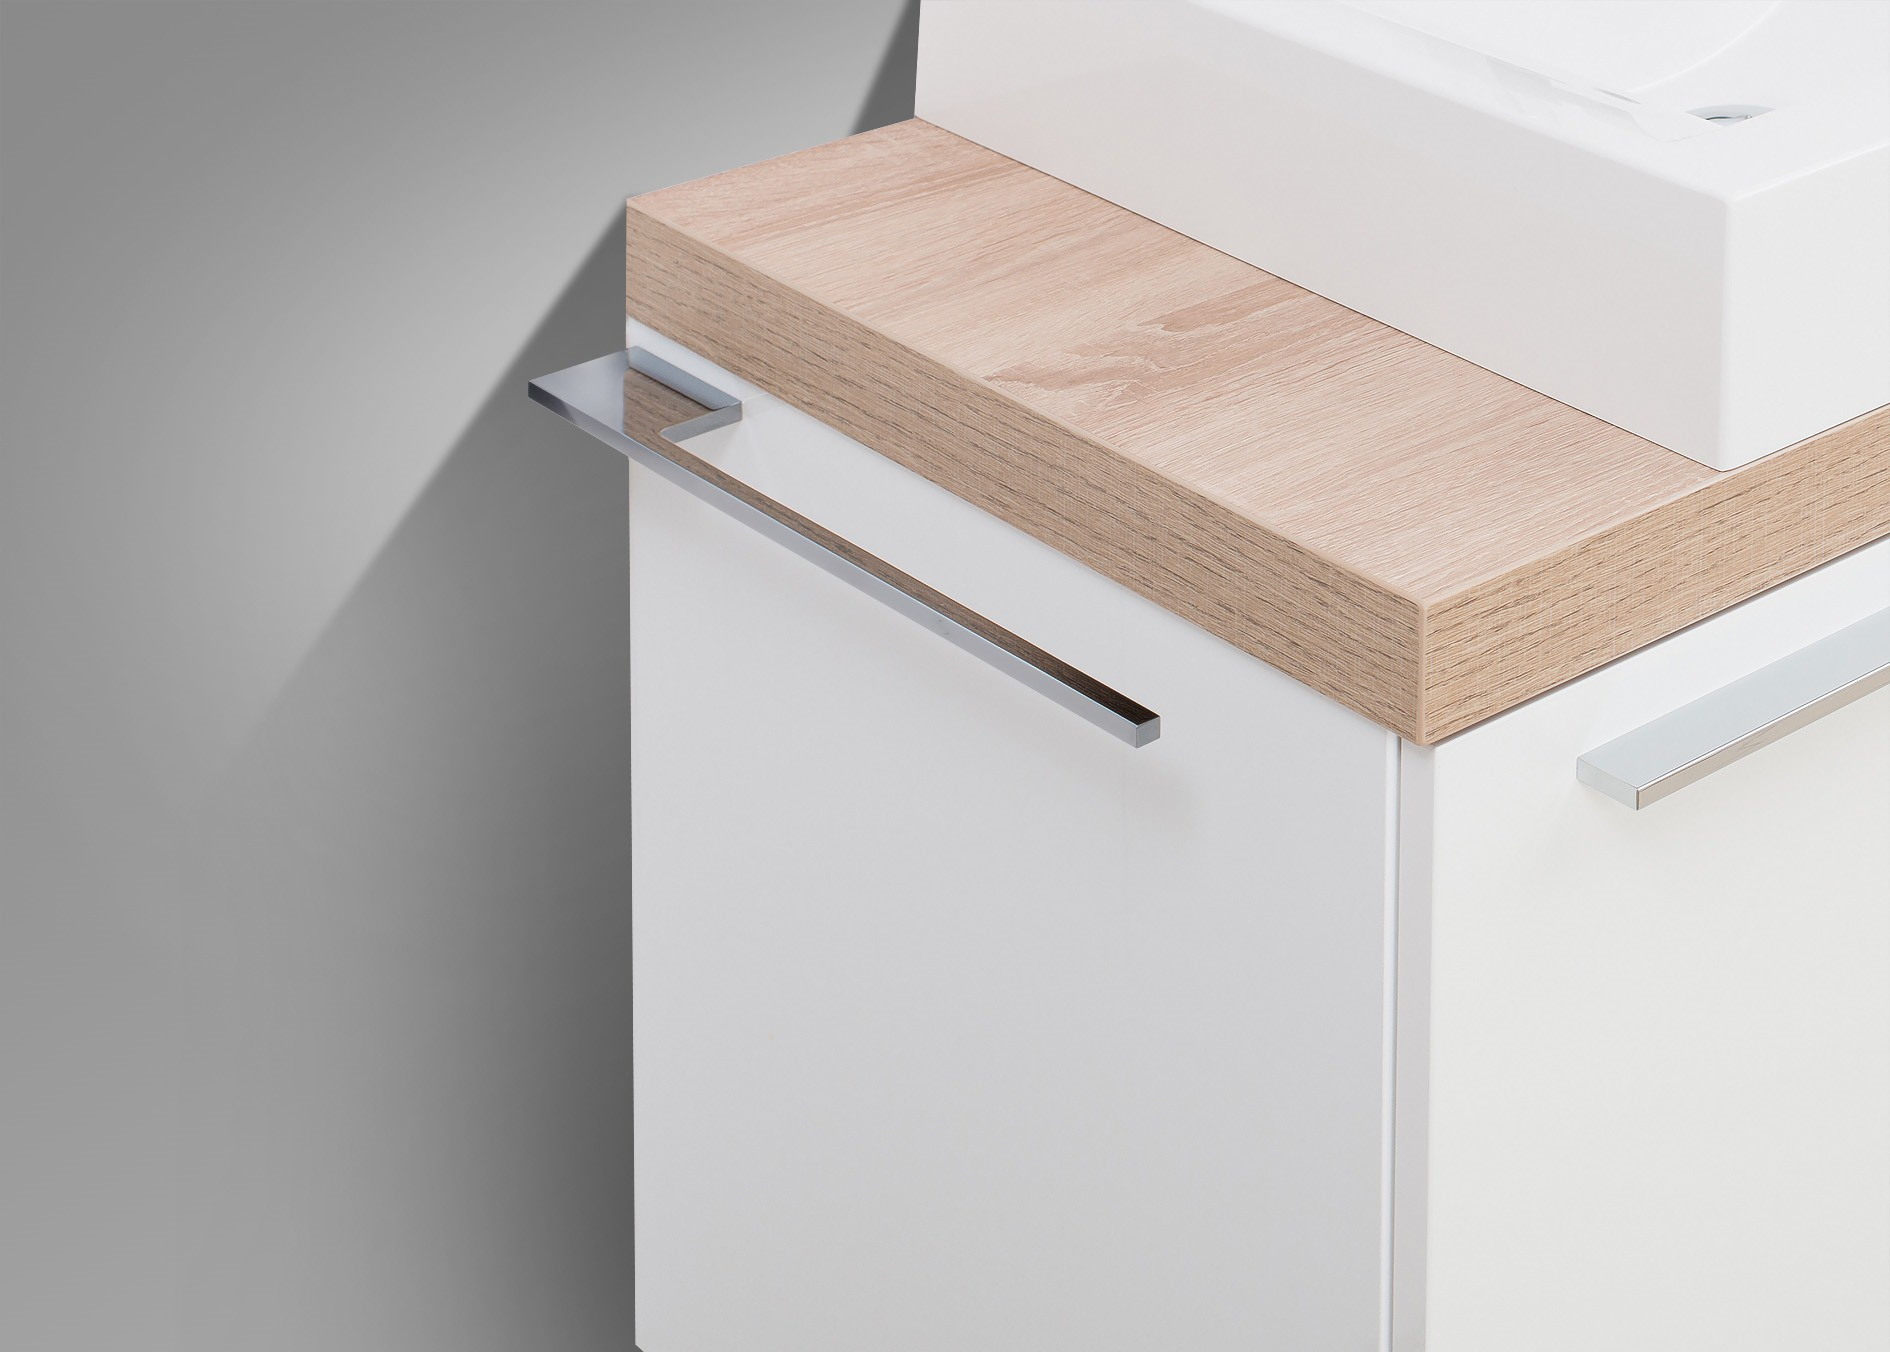 Handtuchhalter Chrom Handtuchstange design bad accessoires